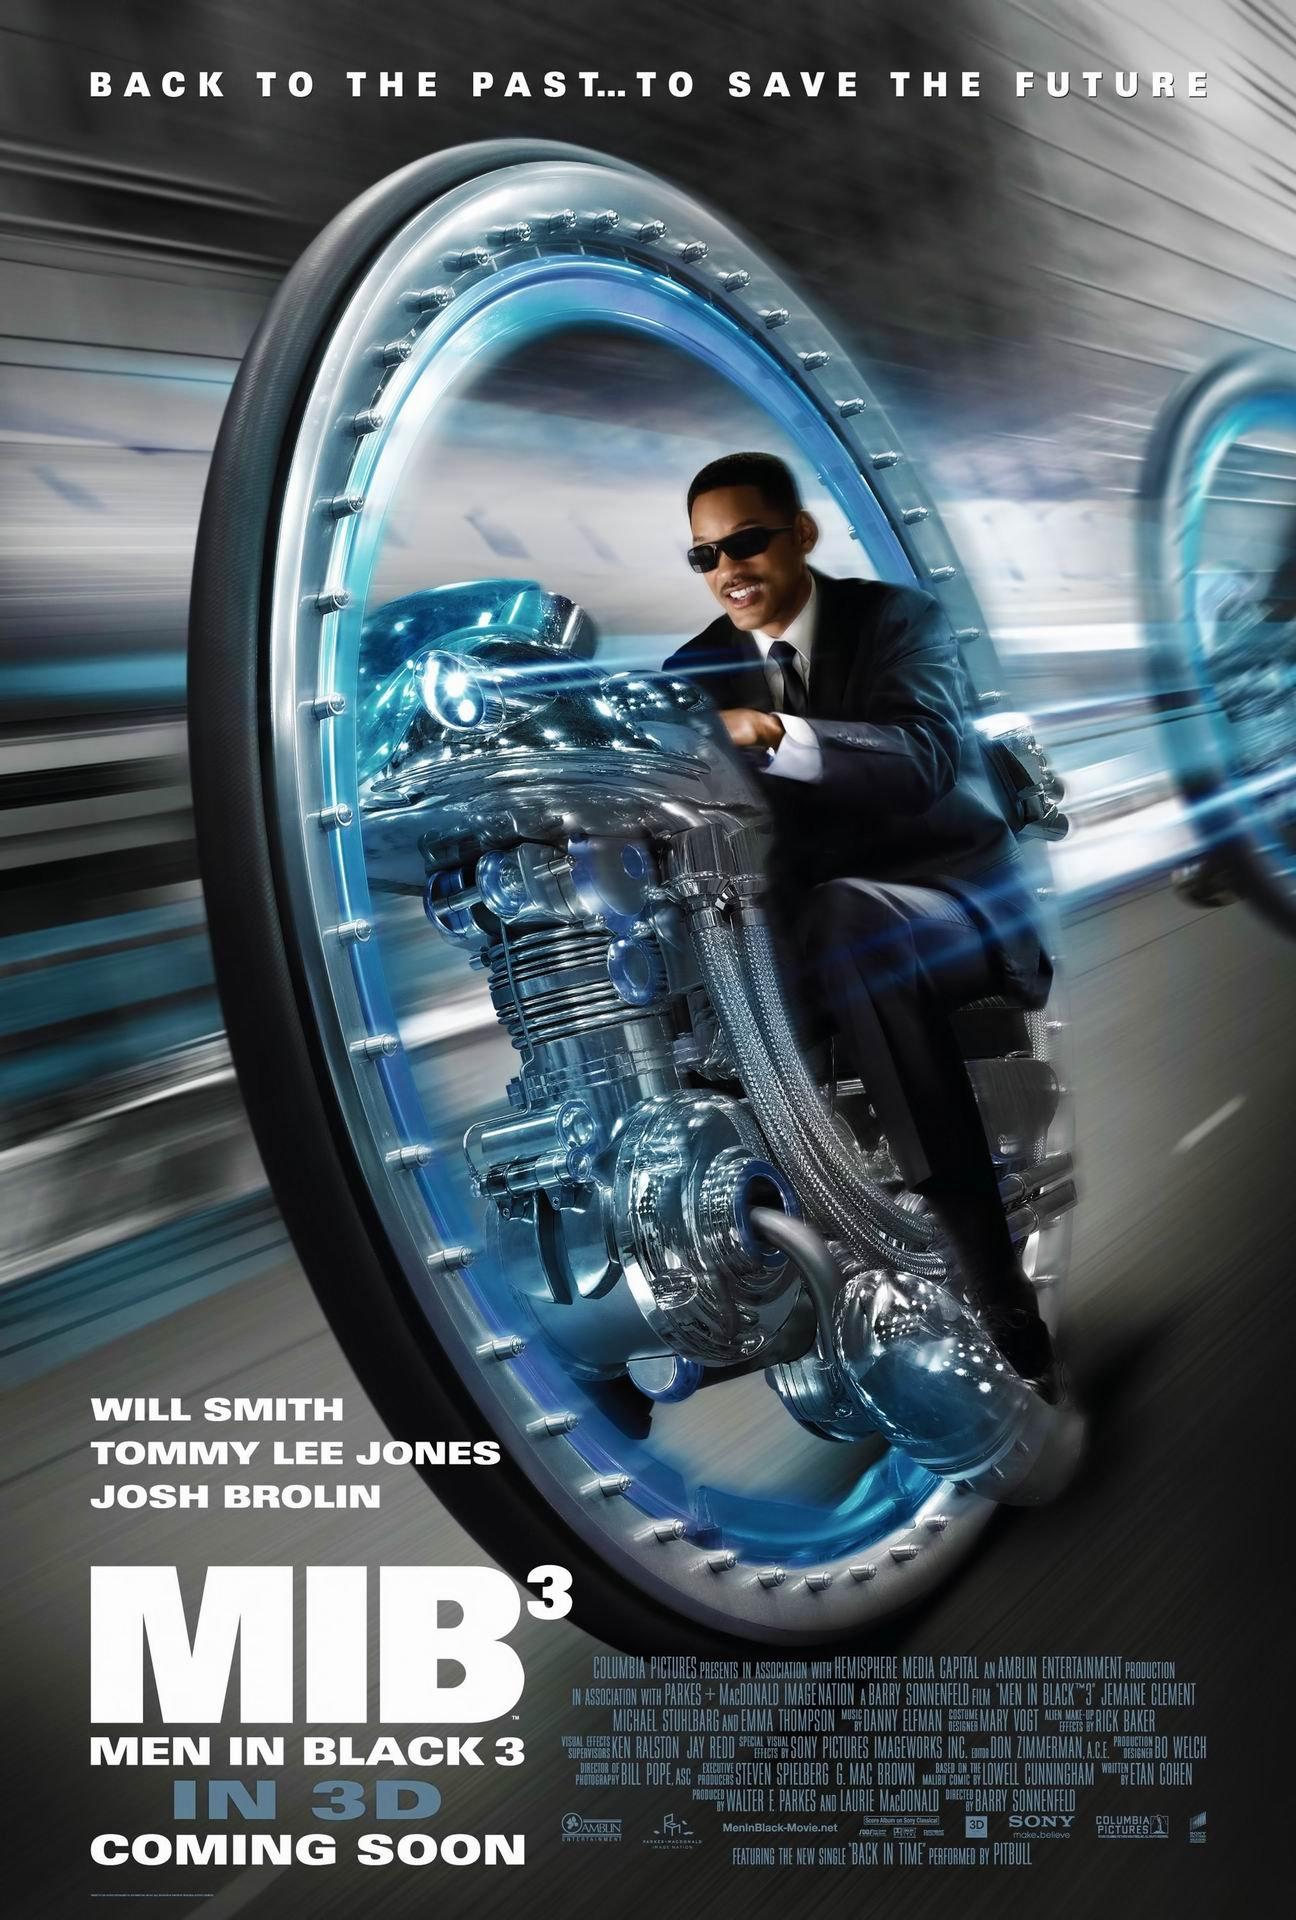 Men in Black 3 (2012) poster - FreeMoviePosters.net